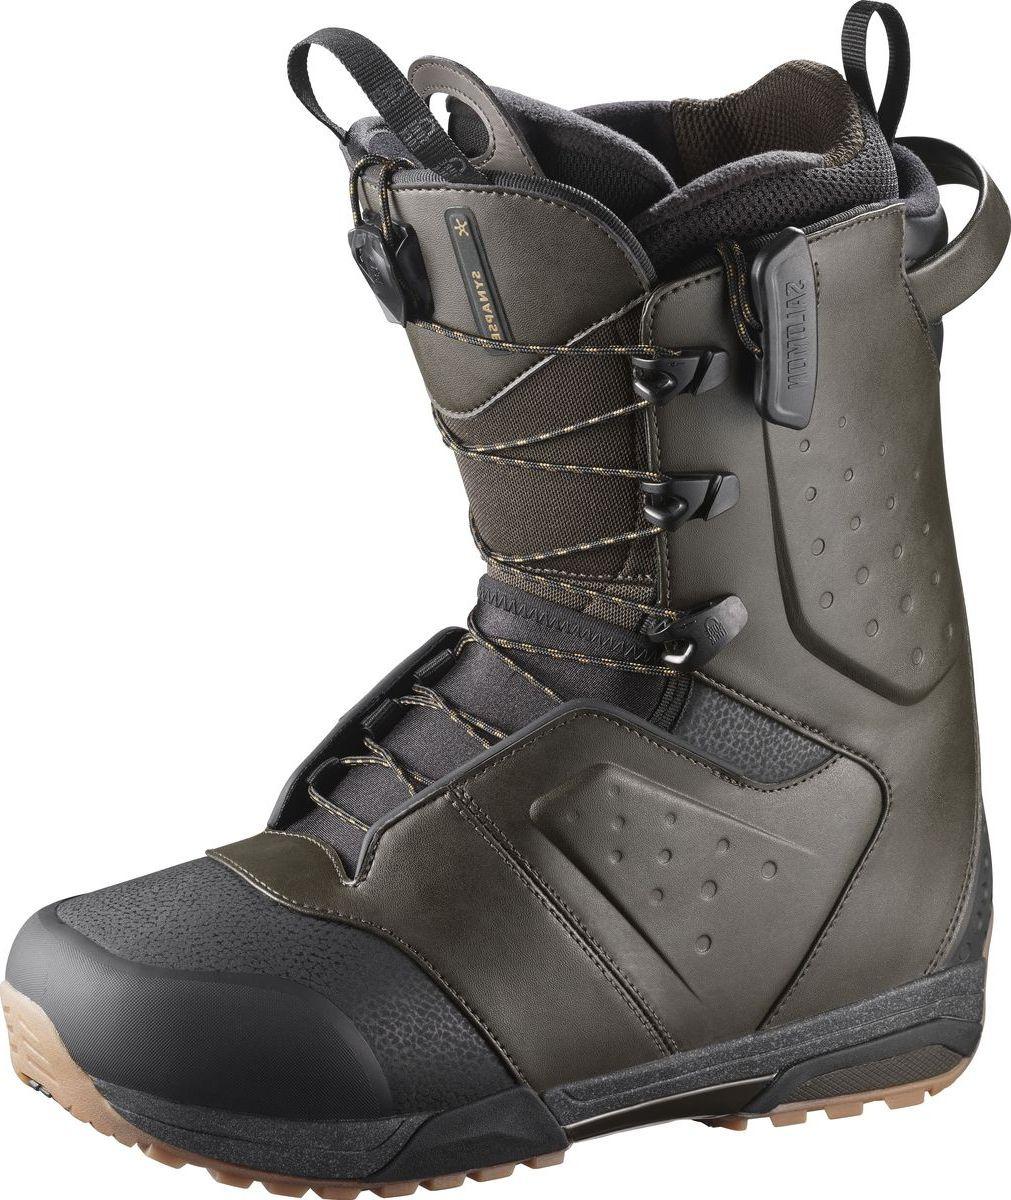 "Ботинки для сноуборда Salomon ""Synapse"", цвет: темно-зеленый. Размер 28 (42,5)"